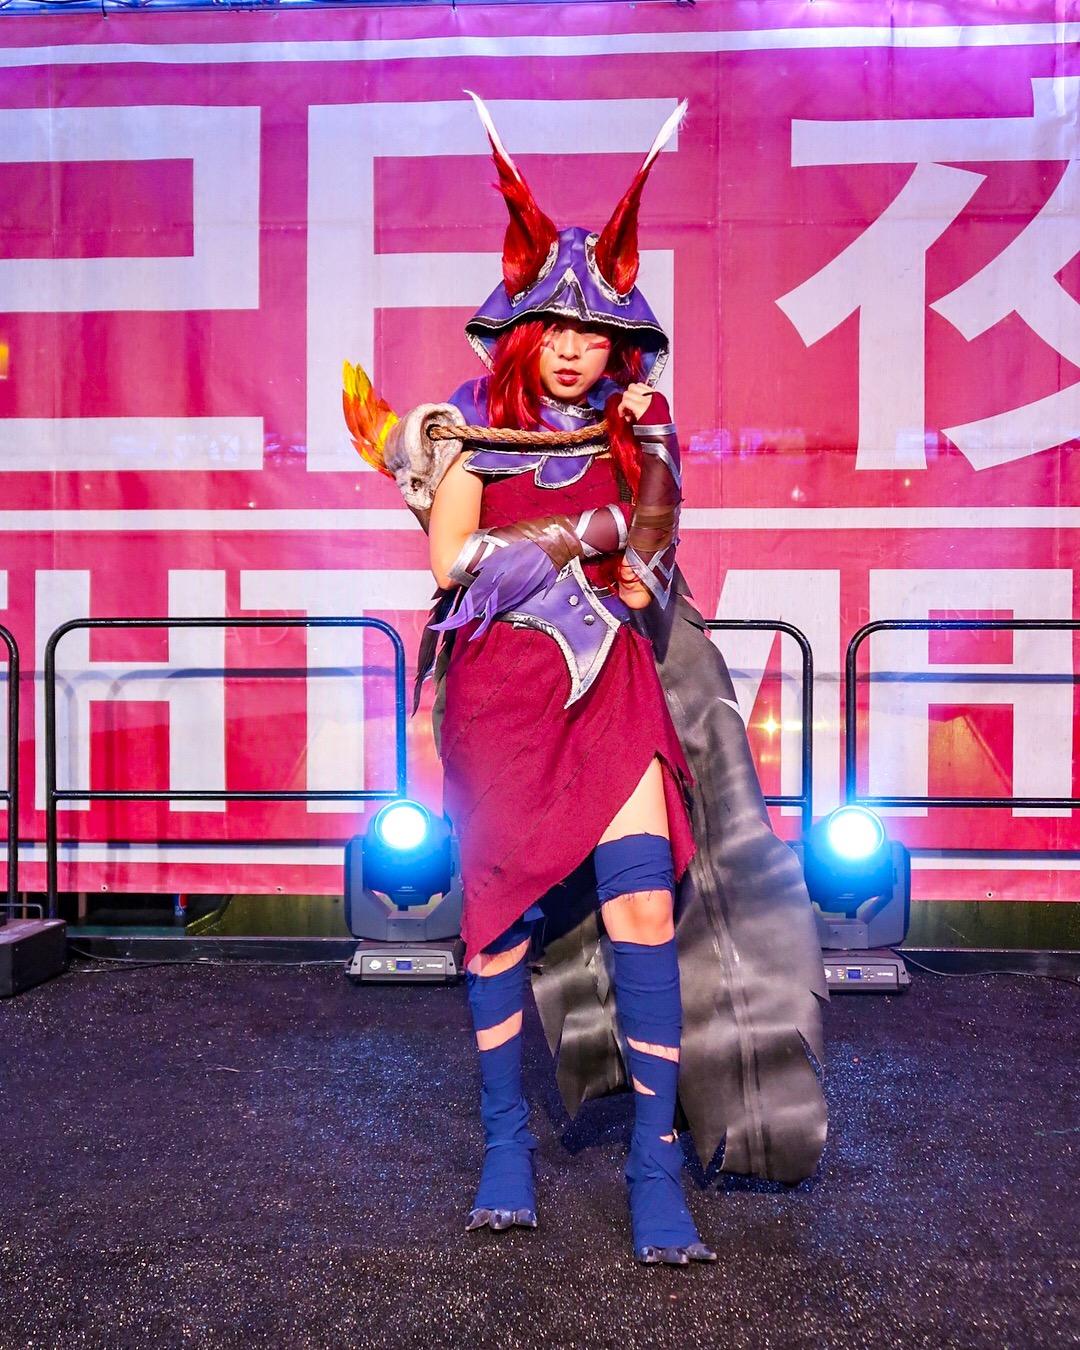 626-night-market-cosplay-contest-league-of-legands-xayah-2.JPG